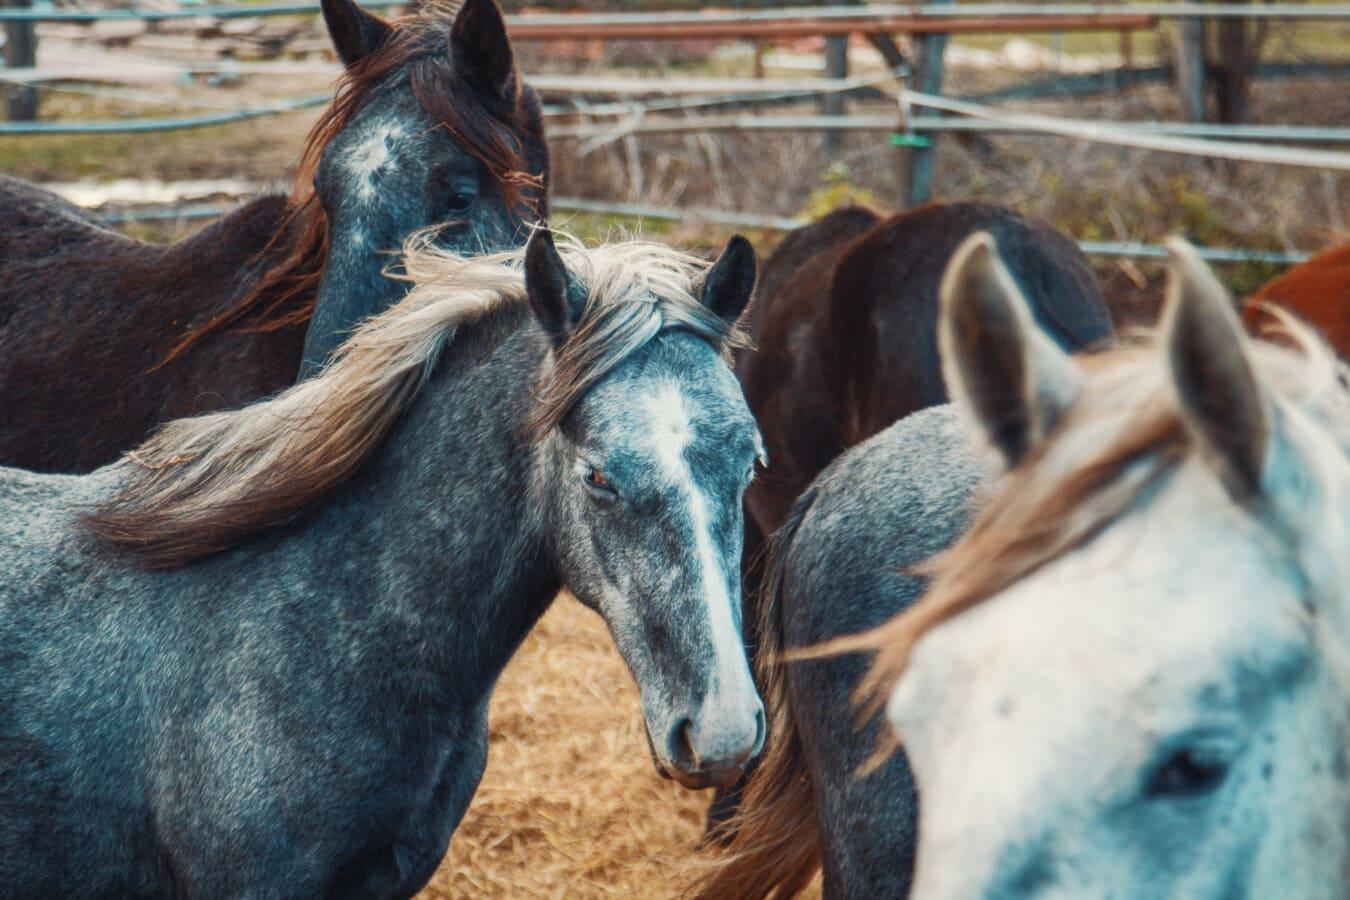 chevaux, cheval, ferme, nature, animal, cavalerie, Mare, équins, Stallion, rural